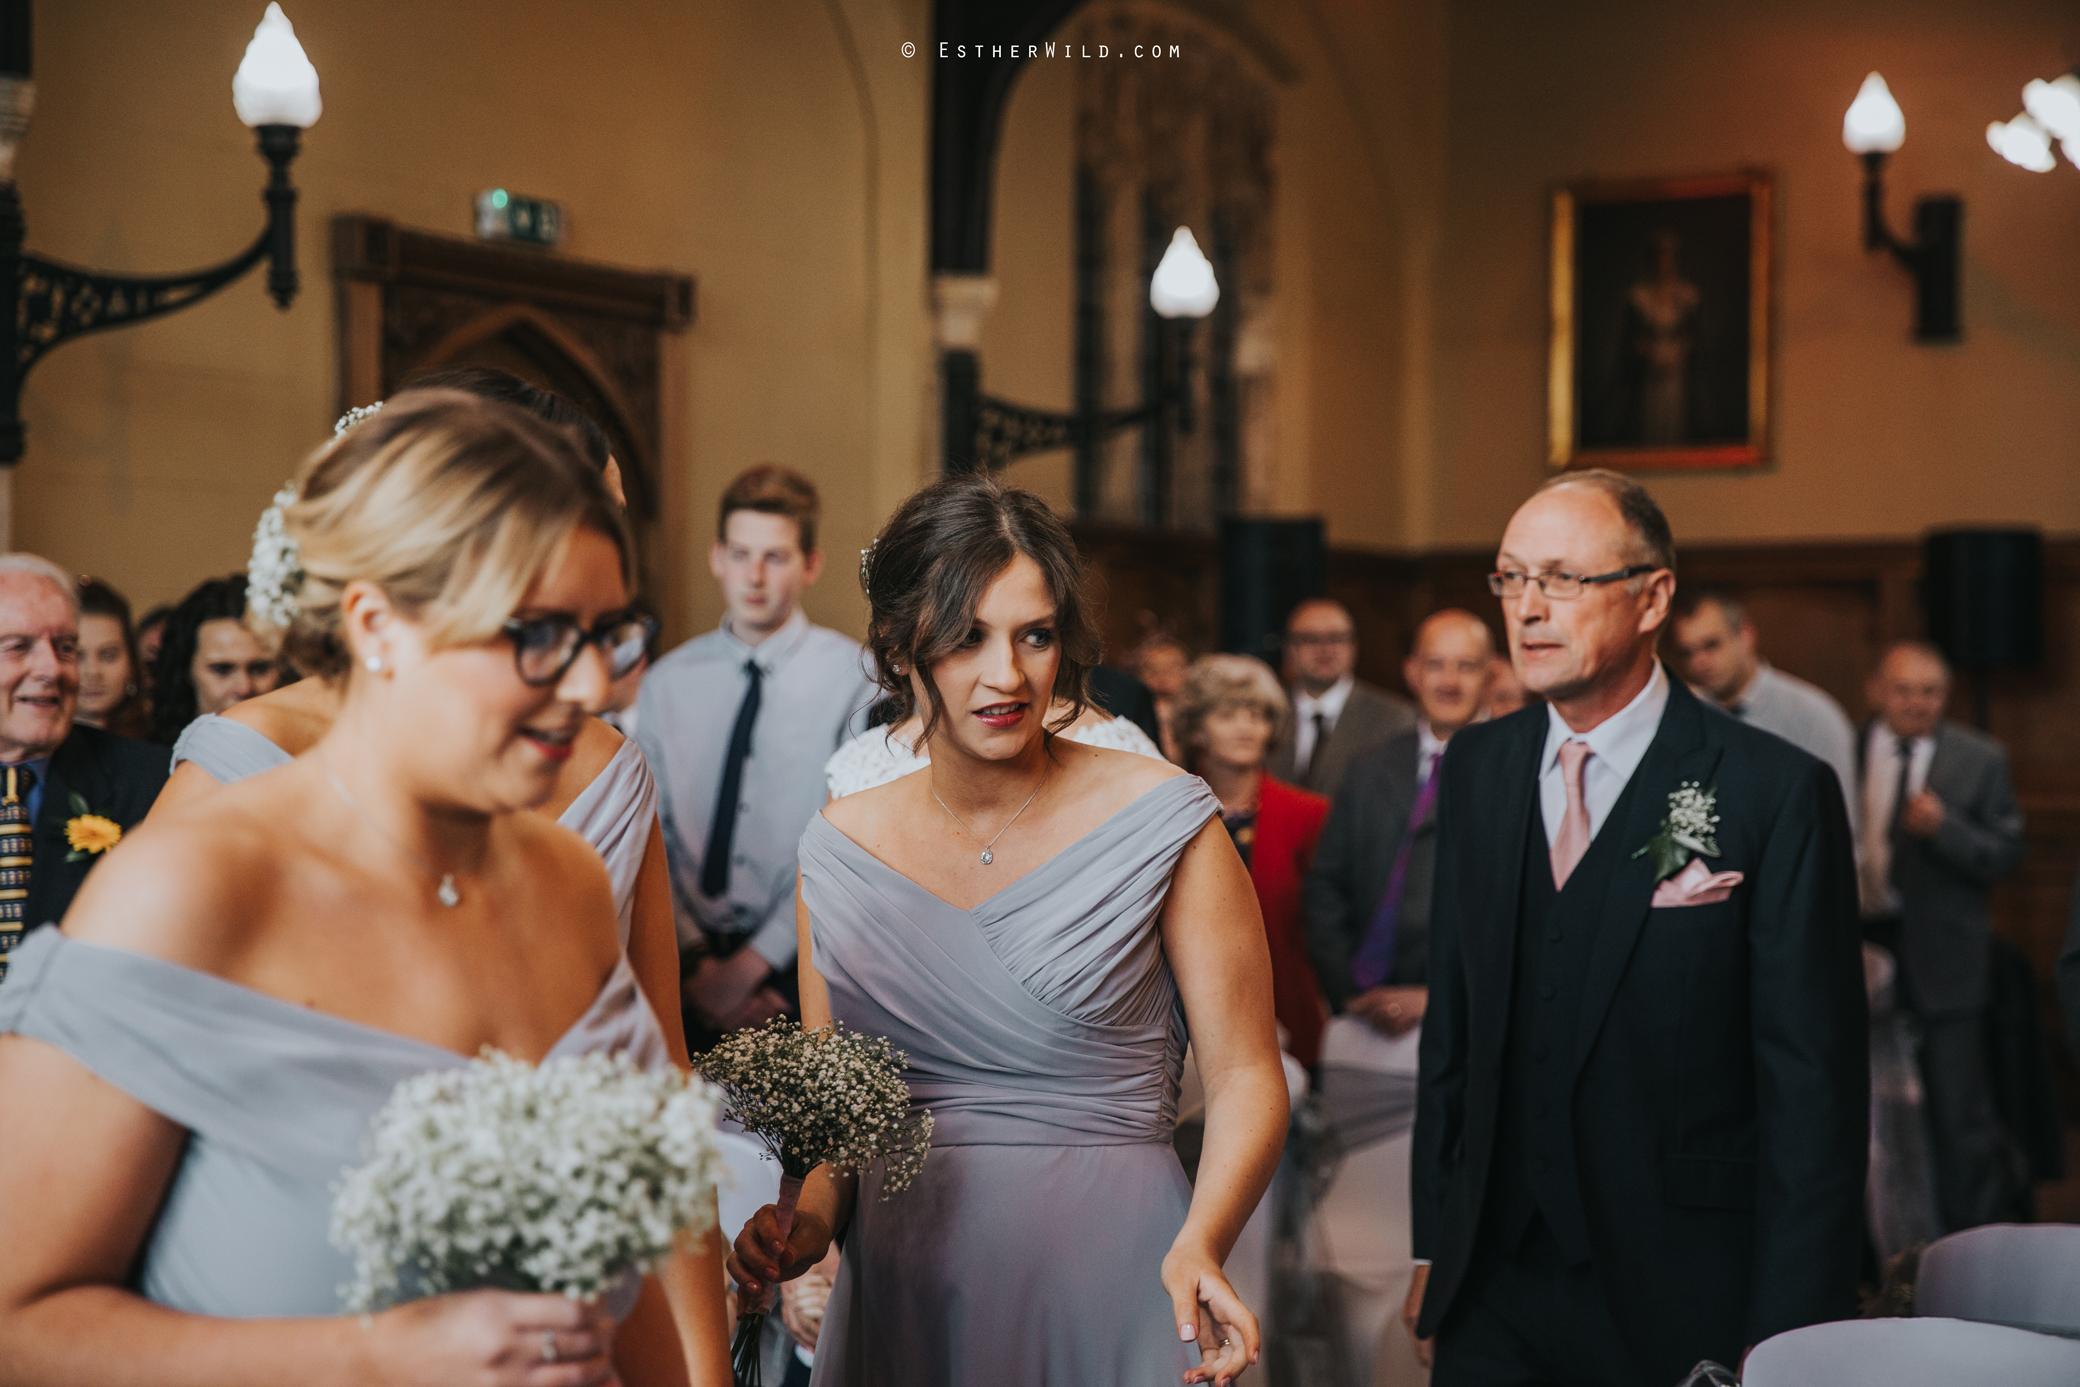 Wedding_Kings_Lynn_Town_Hall_Norfolk_Photographer_Esther_Wild_IMG_0928.jpg